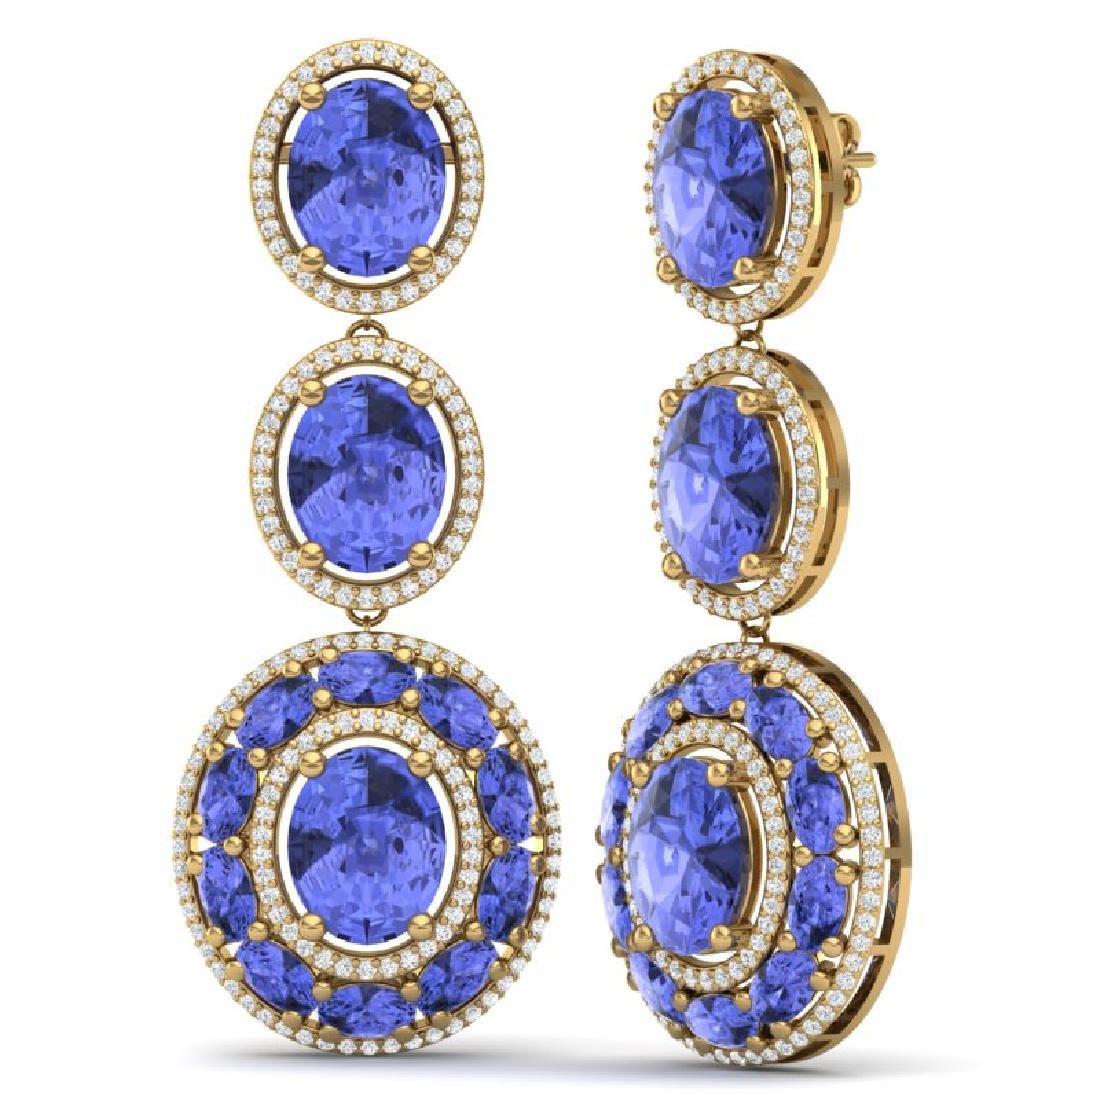 33.72 CTW Royalty Tanzanite & VS Diamond Earrings 18K - 3